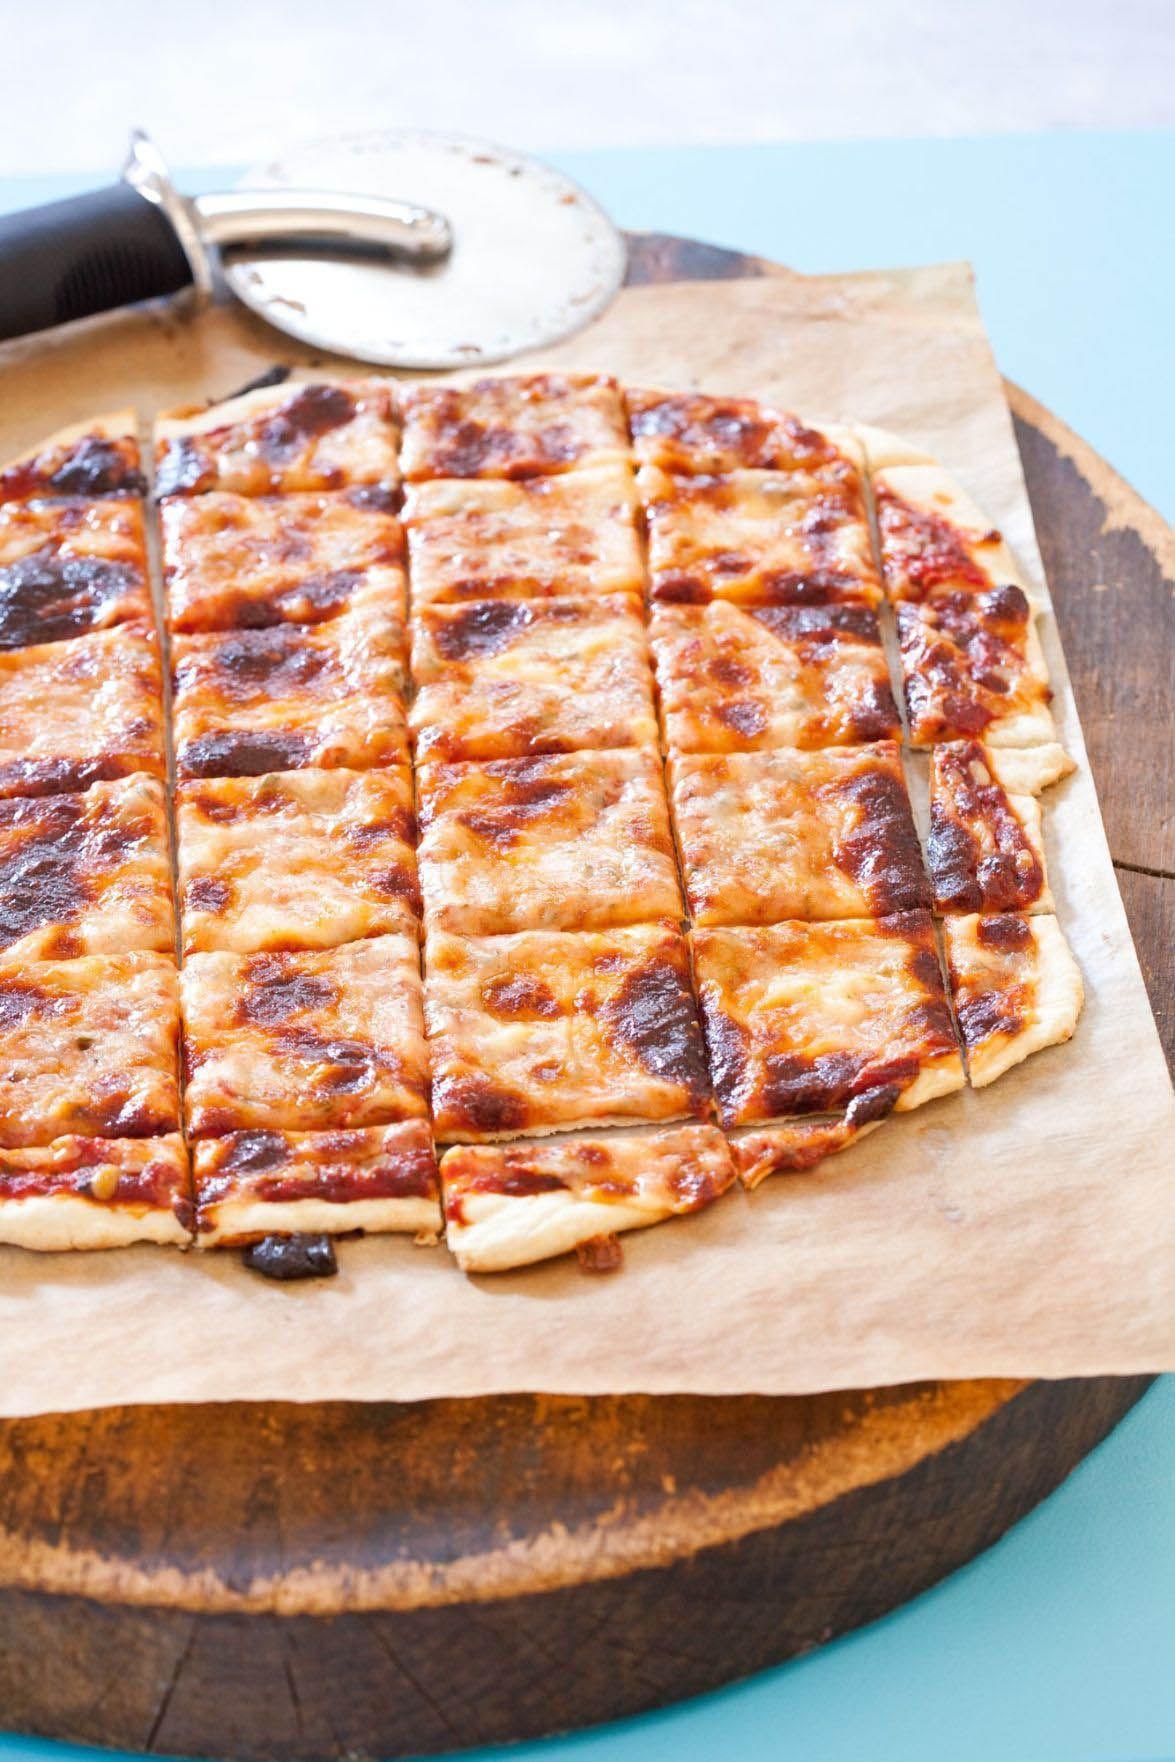 Enjoyable 3 Hour Pizza Dough Recipe Including Healthy Meal Ideas